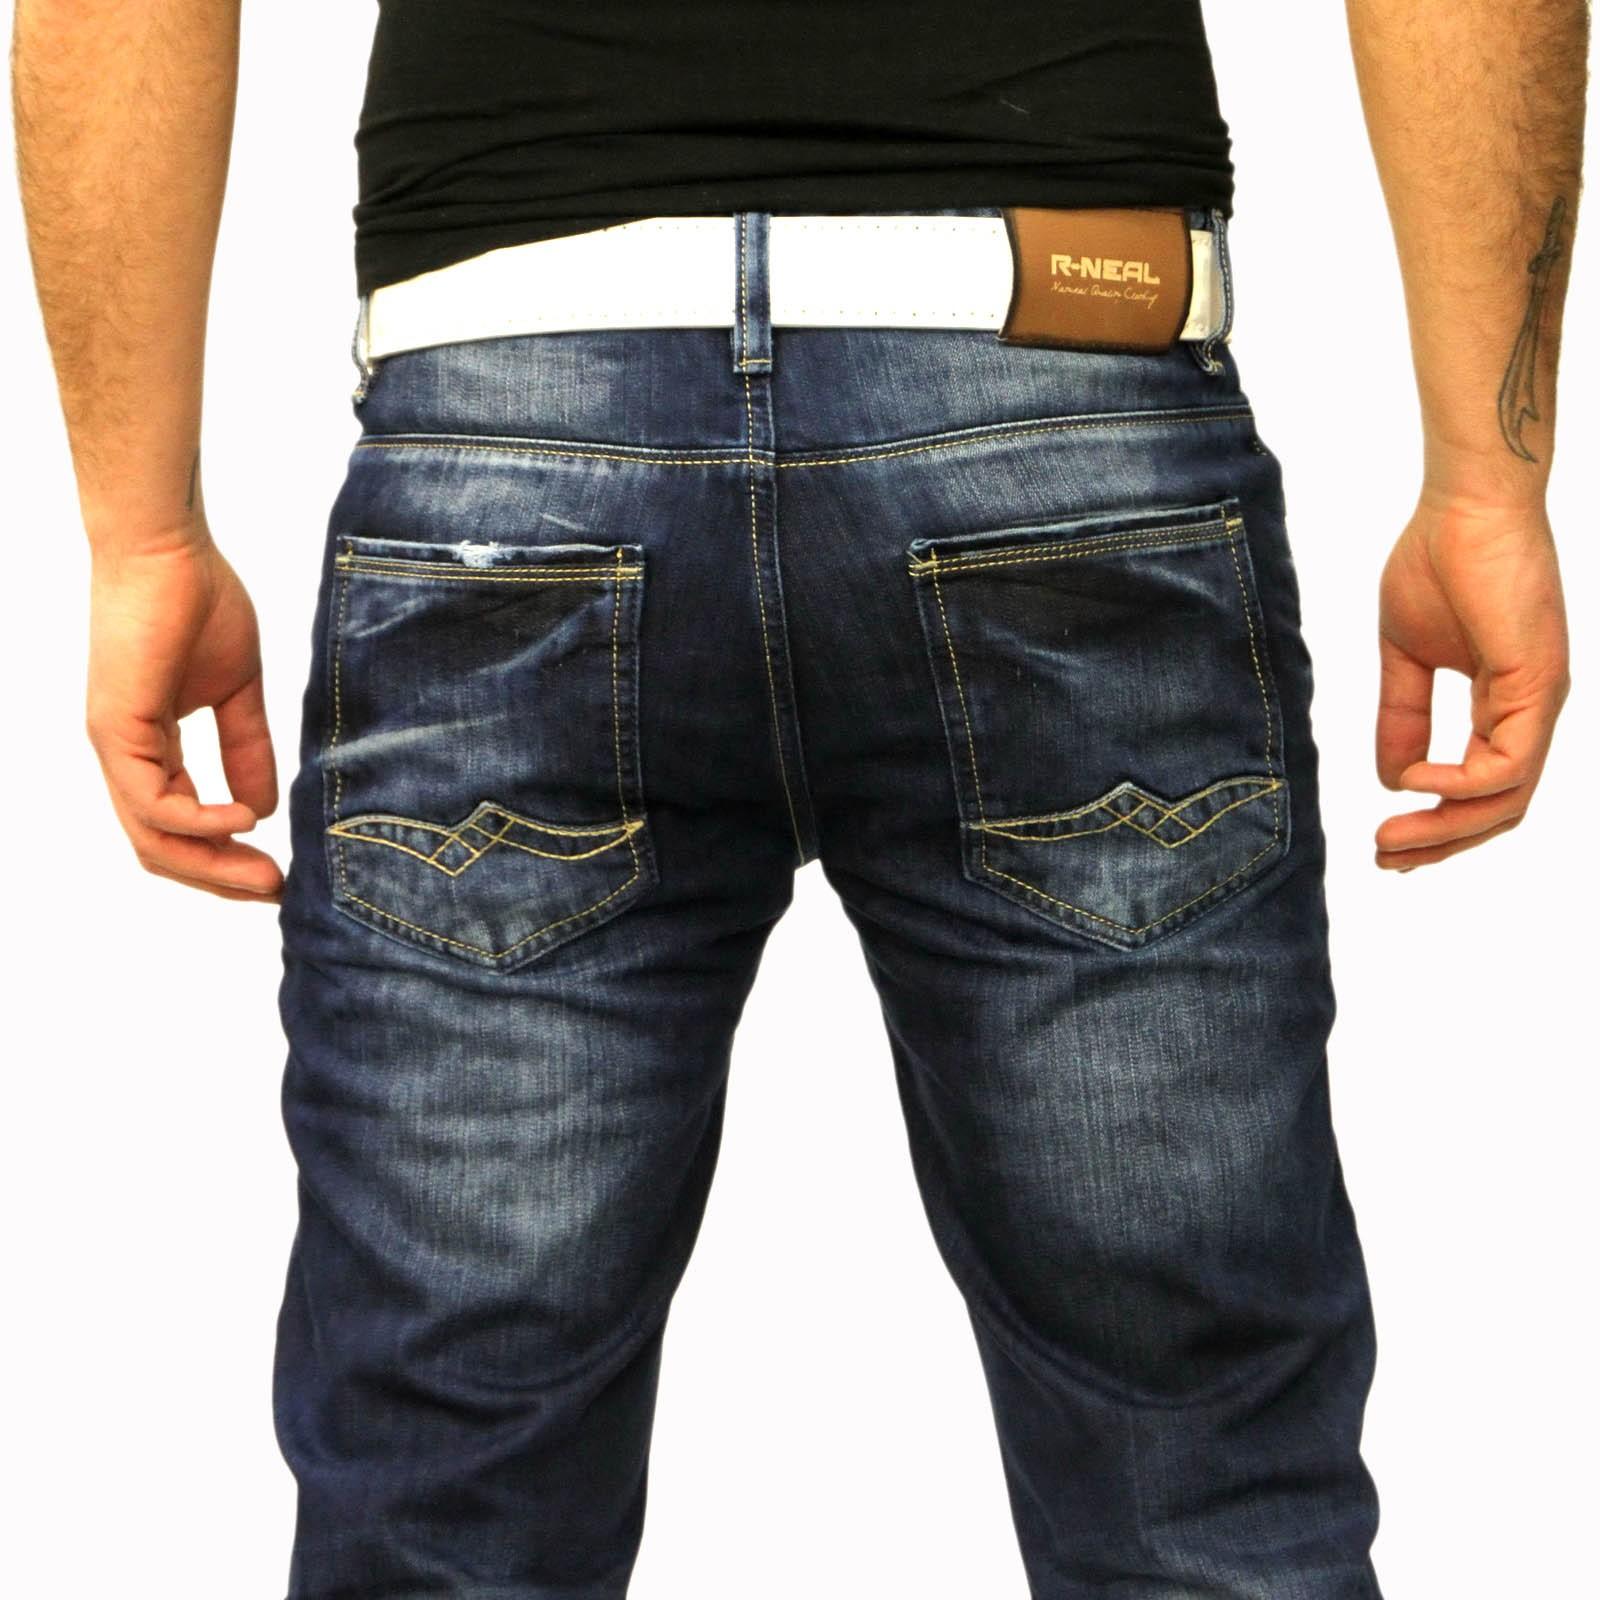 Herren Jeans Hose 7591 Rusty Neal